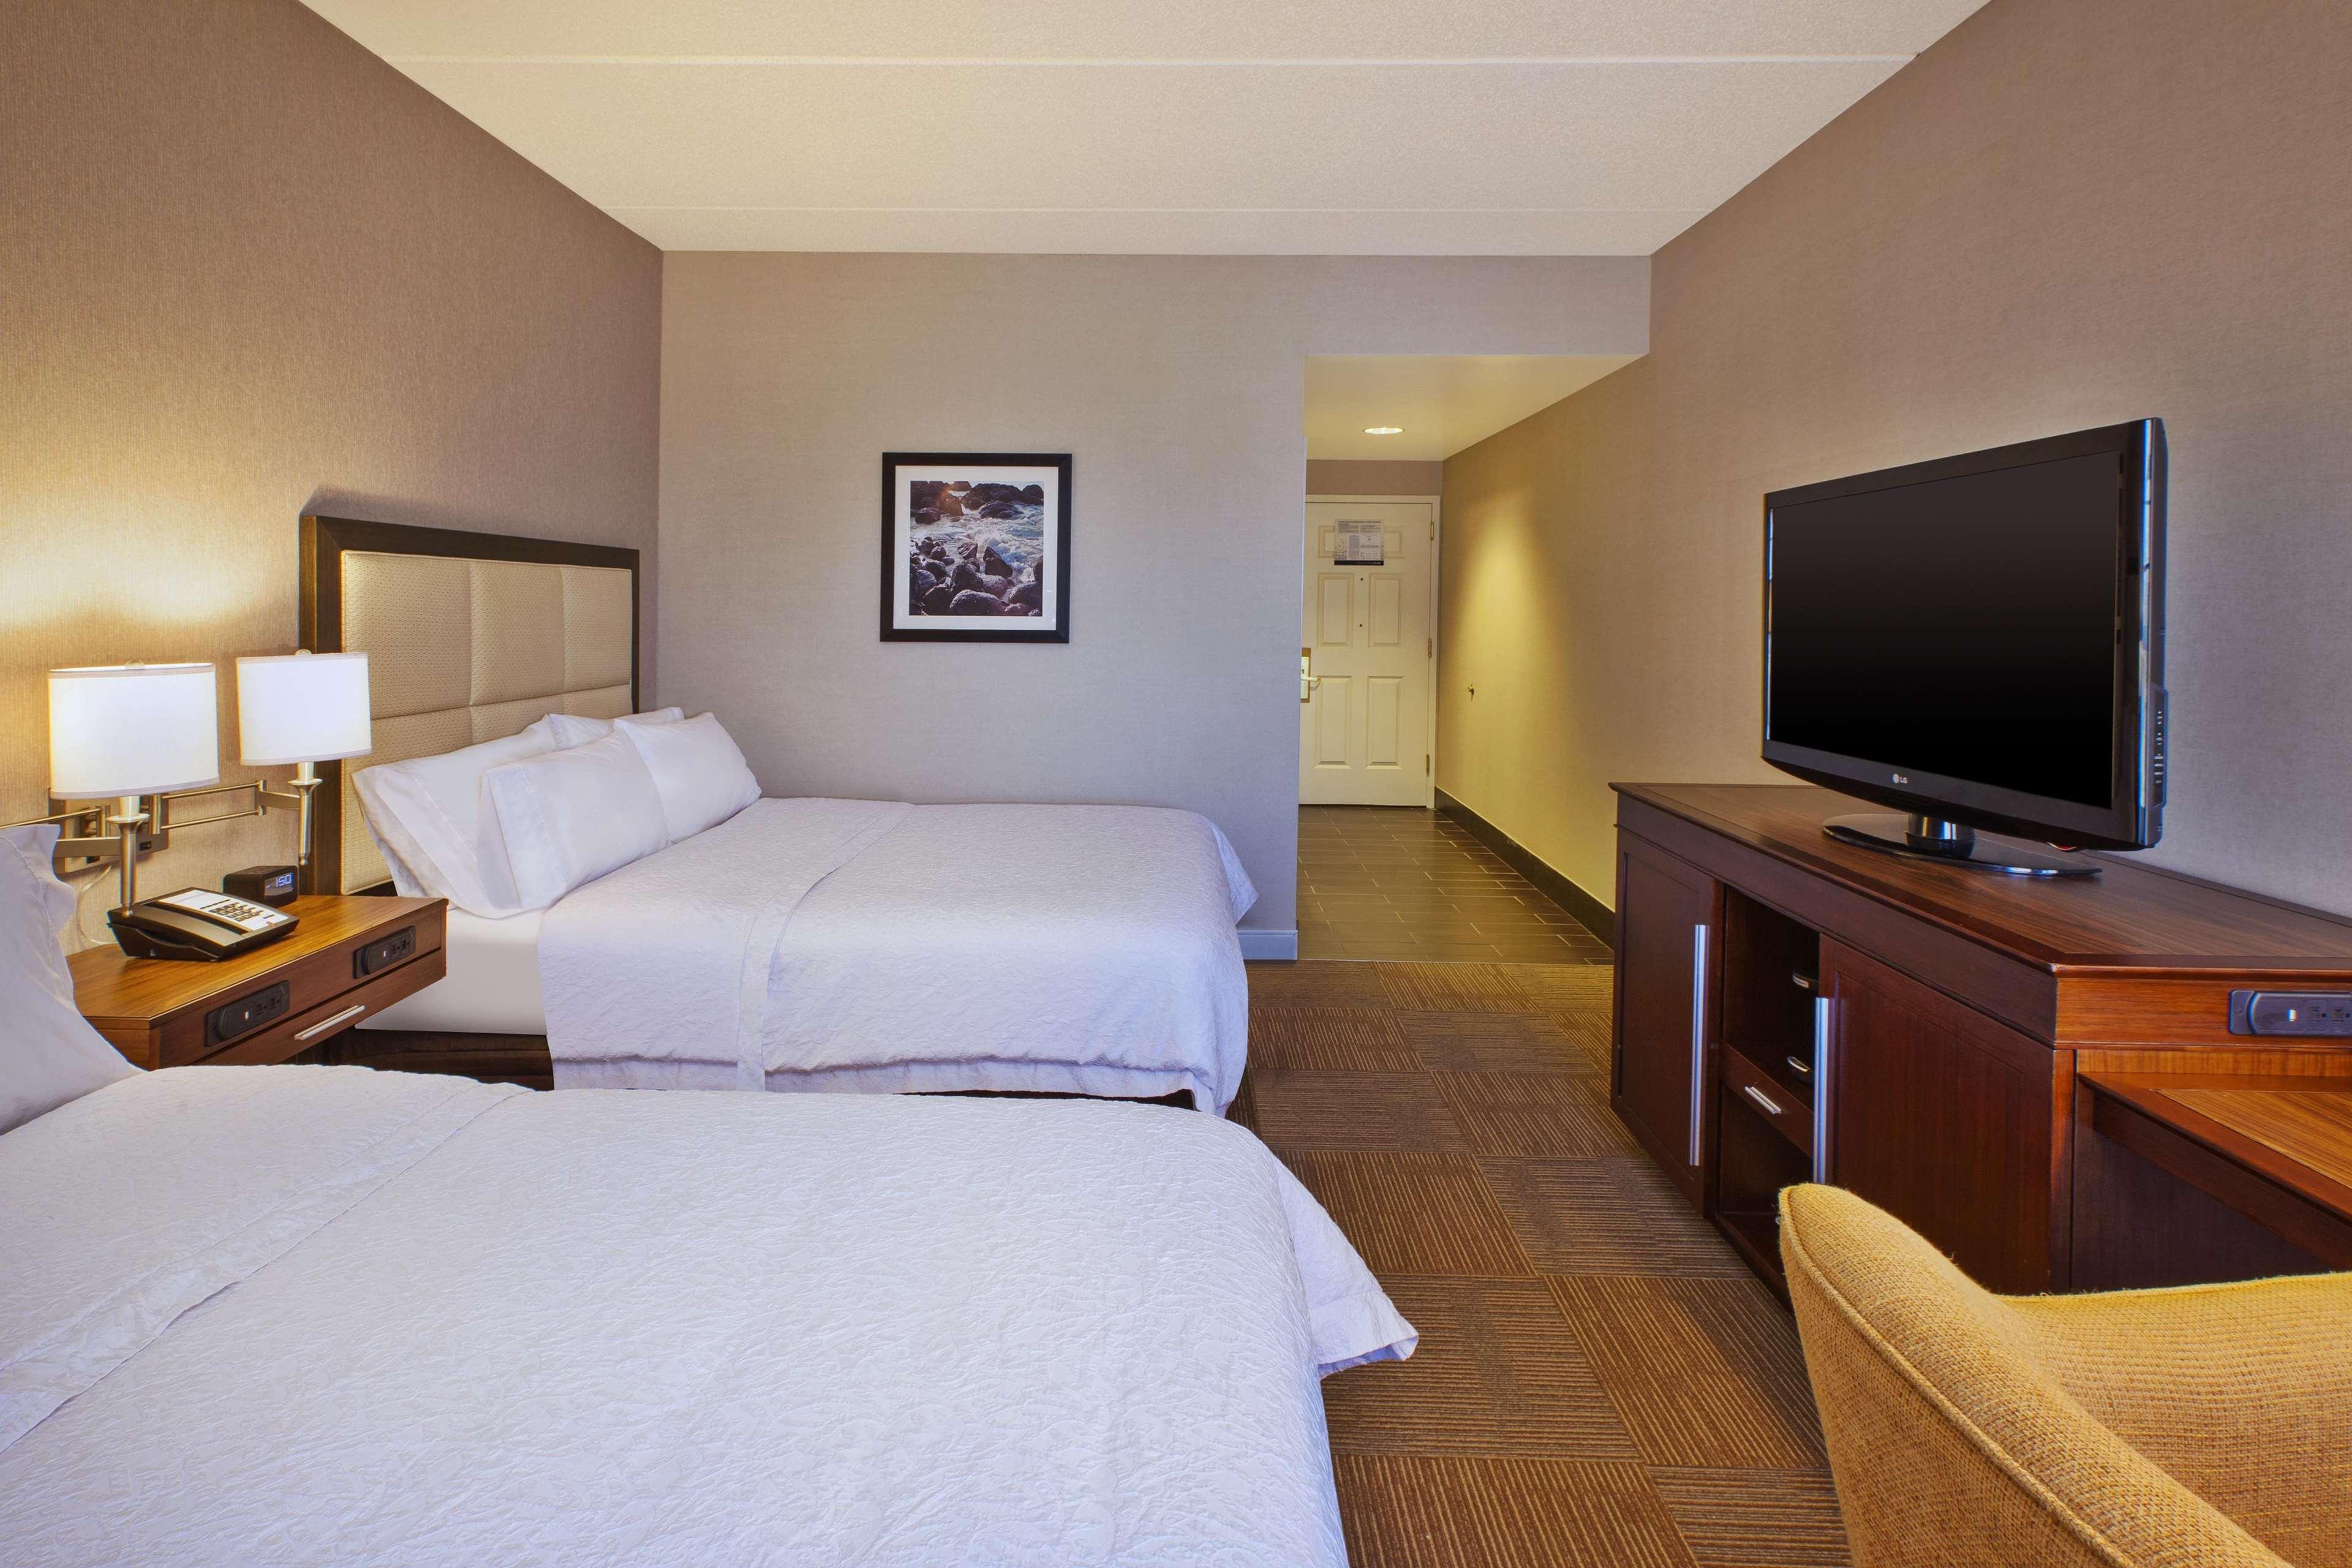 Hampton Inn & Suites Providence/Warwick-Airport image 37